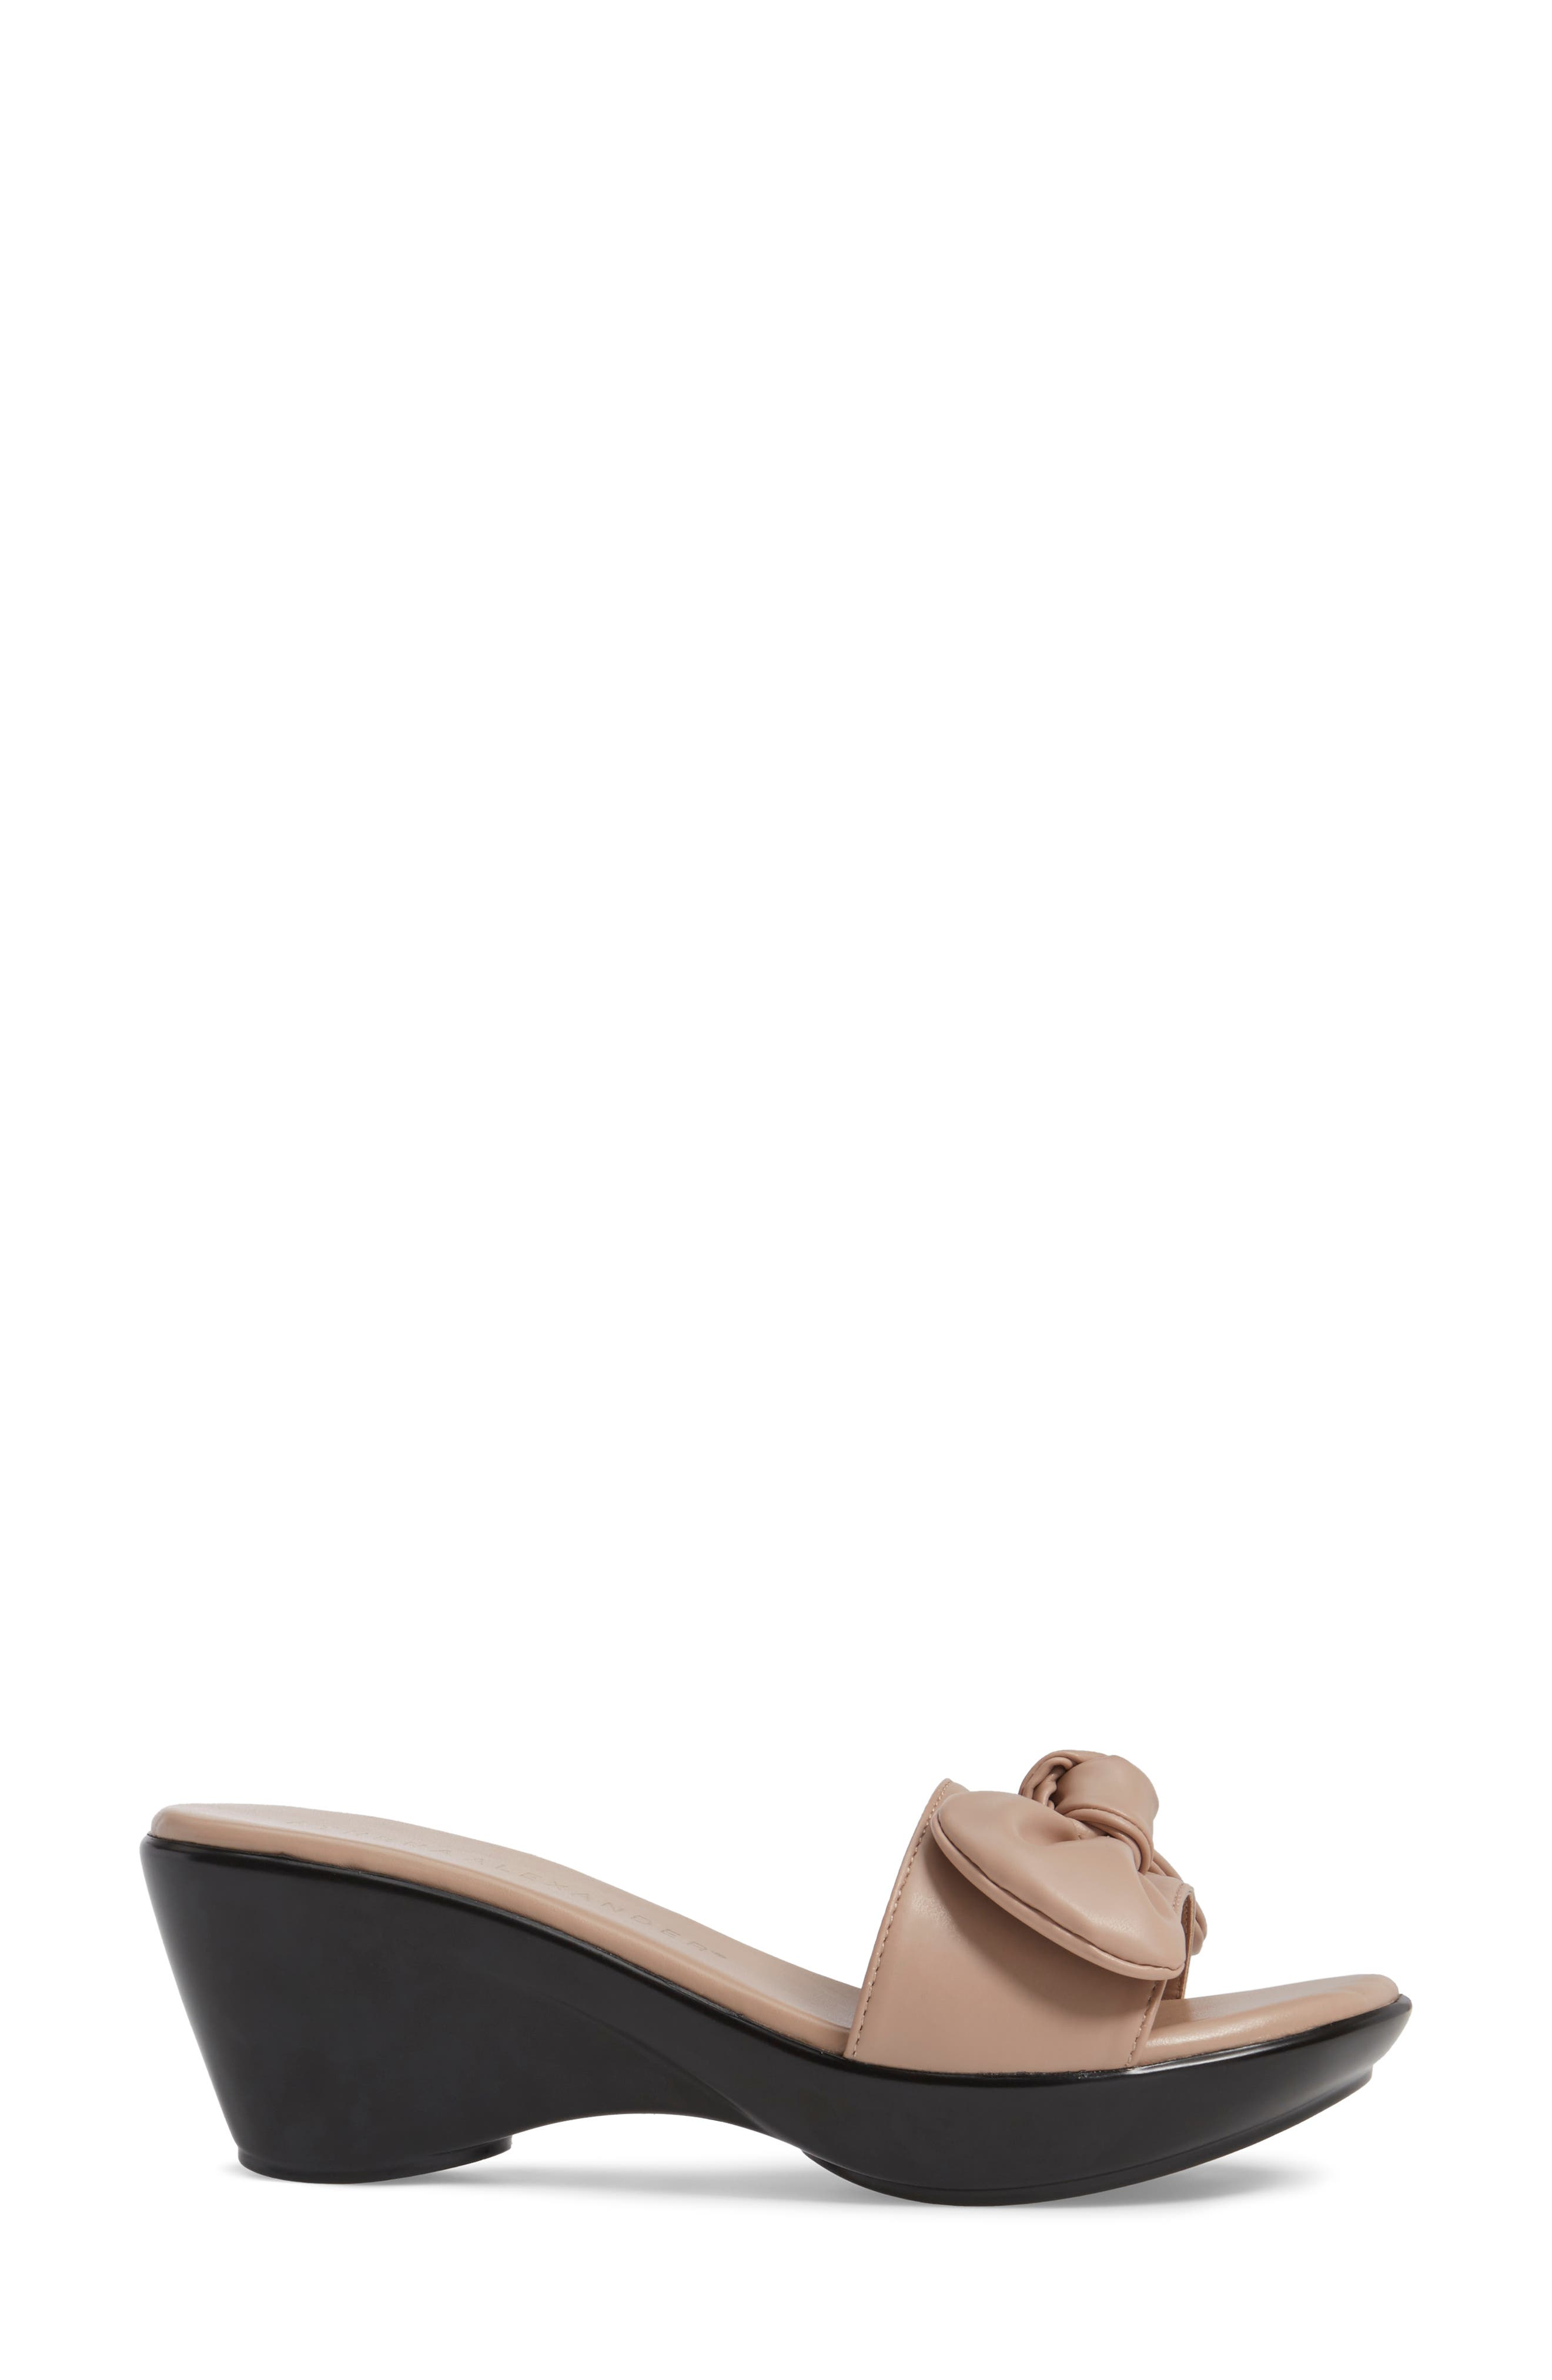 Pattye Knotted Slide Sandal,                             Alternate thumbnail 3, color,                             Blush Faux Leather